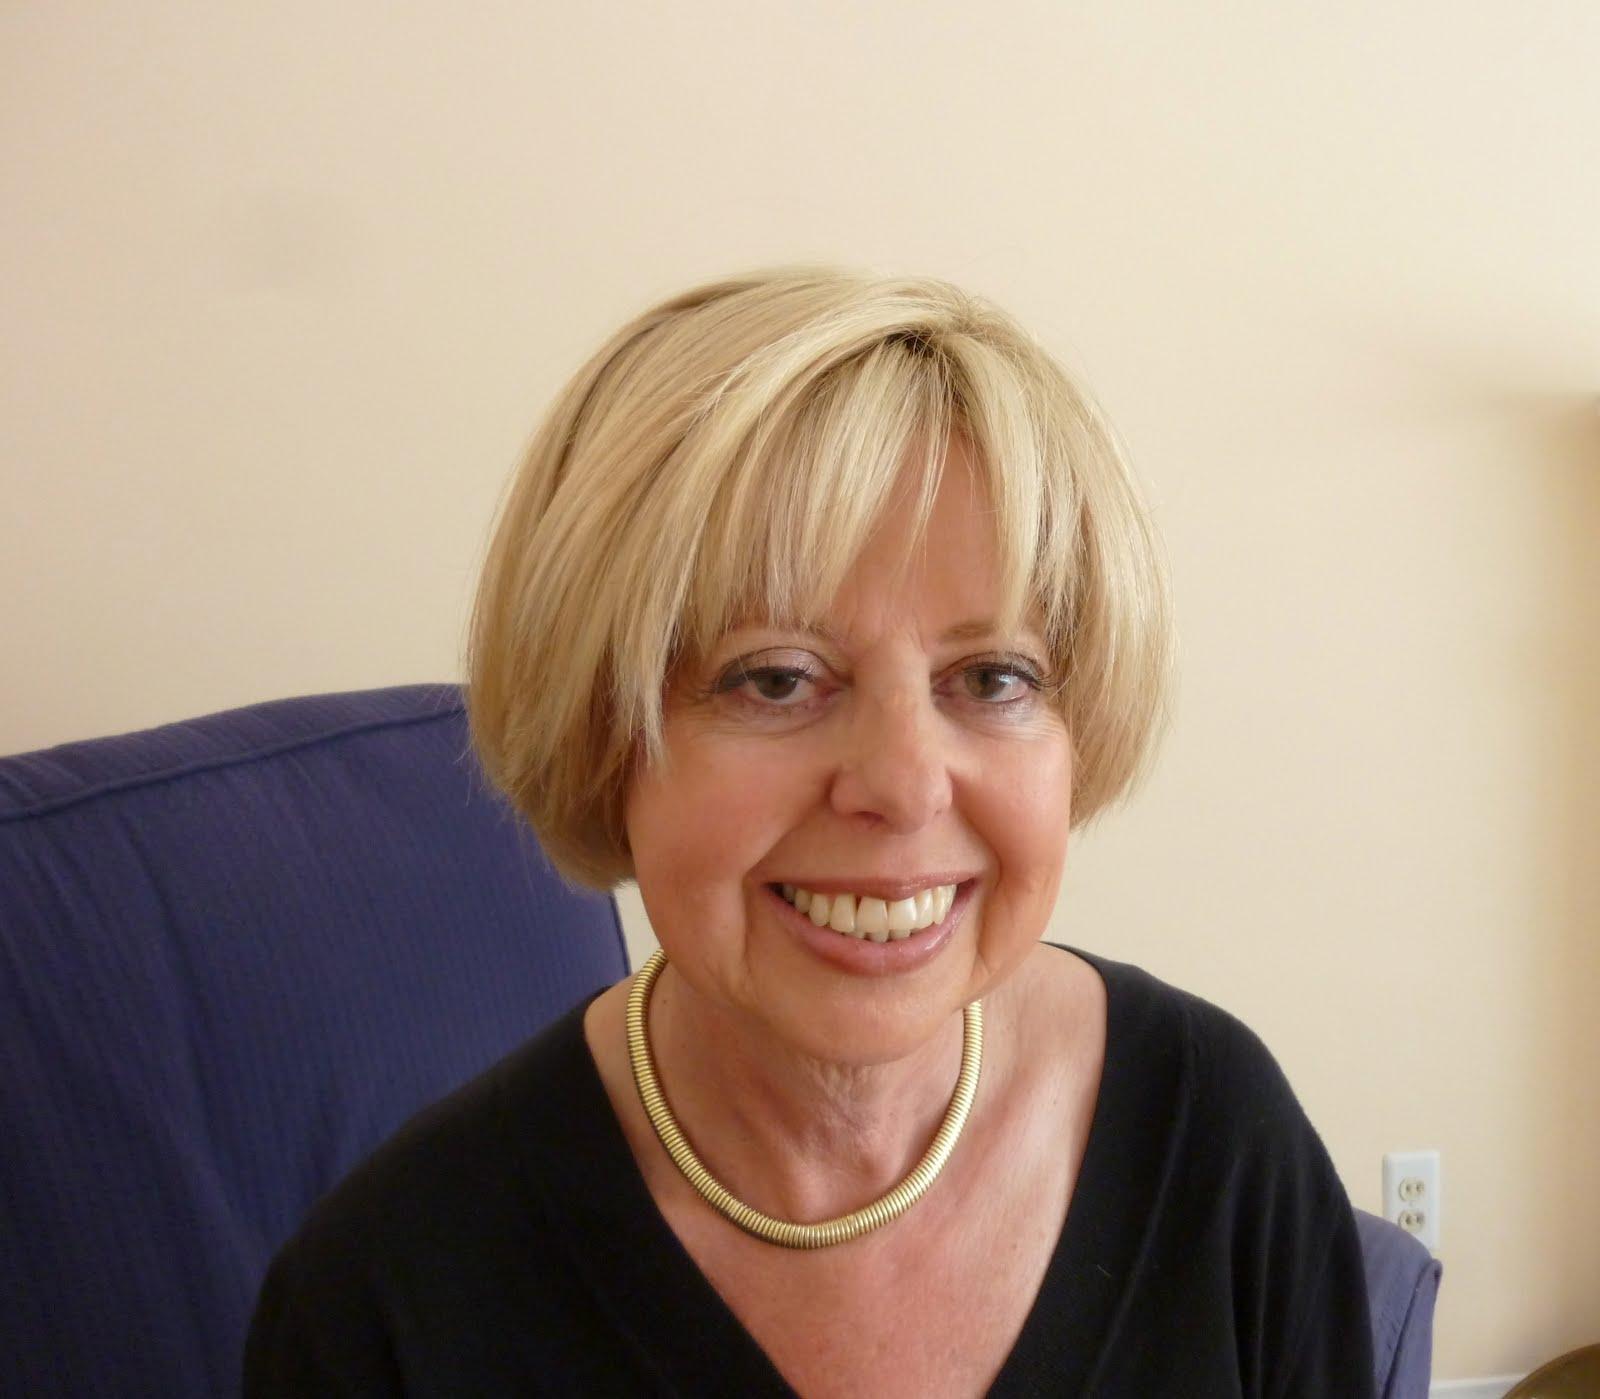 Dr. Fay Van Der Kar Levinson